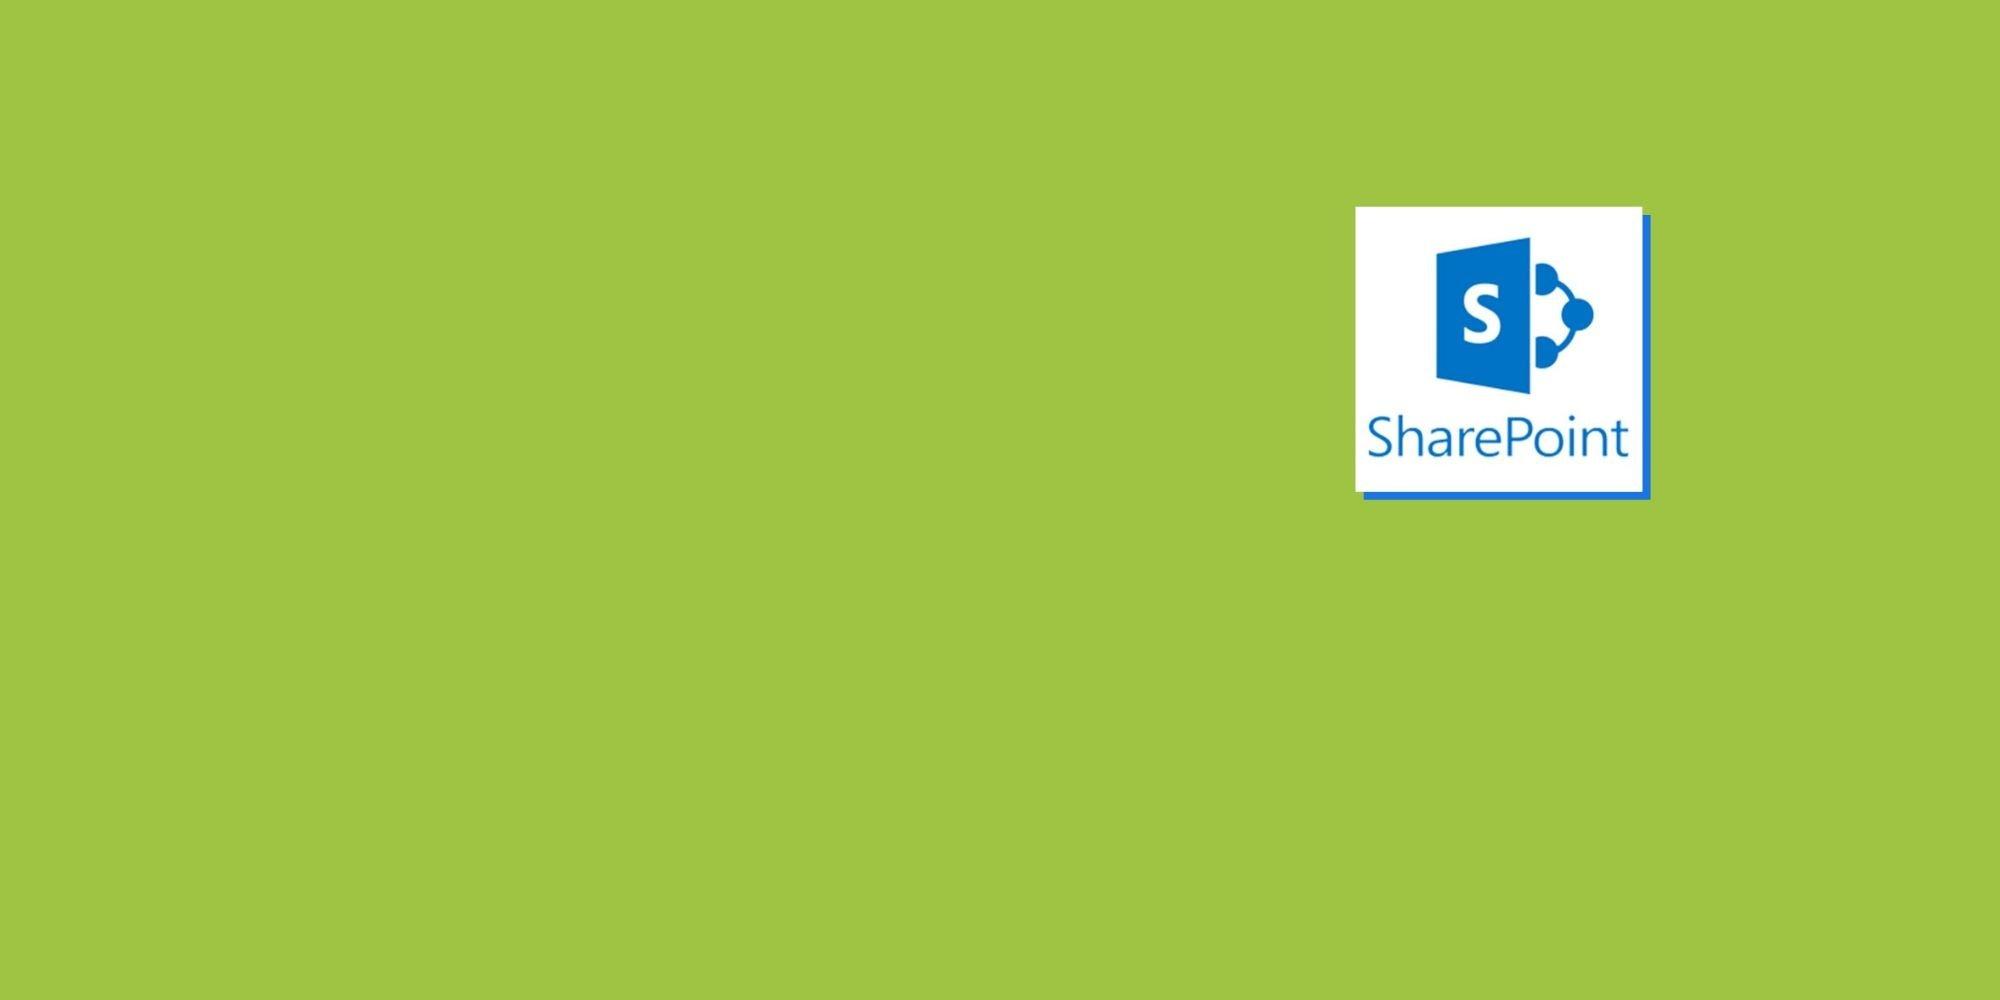 ms-sharepoint-2013-training